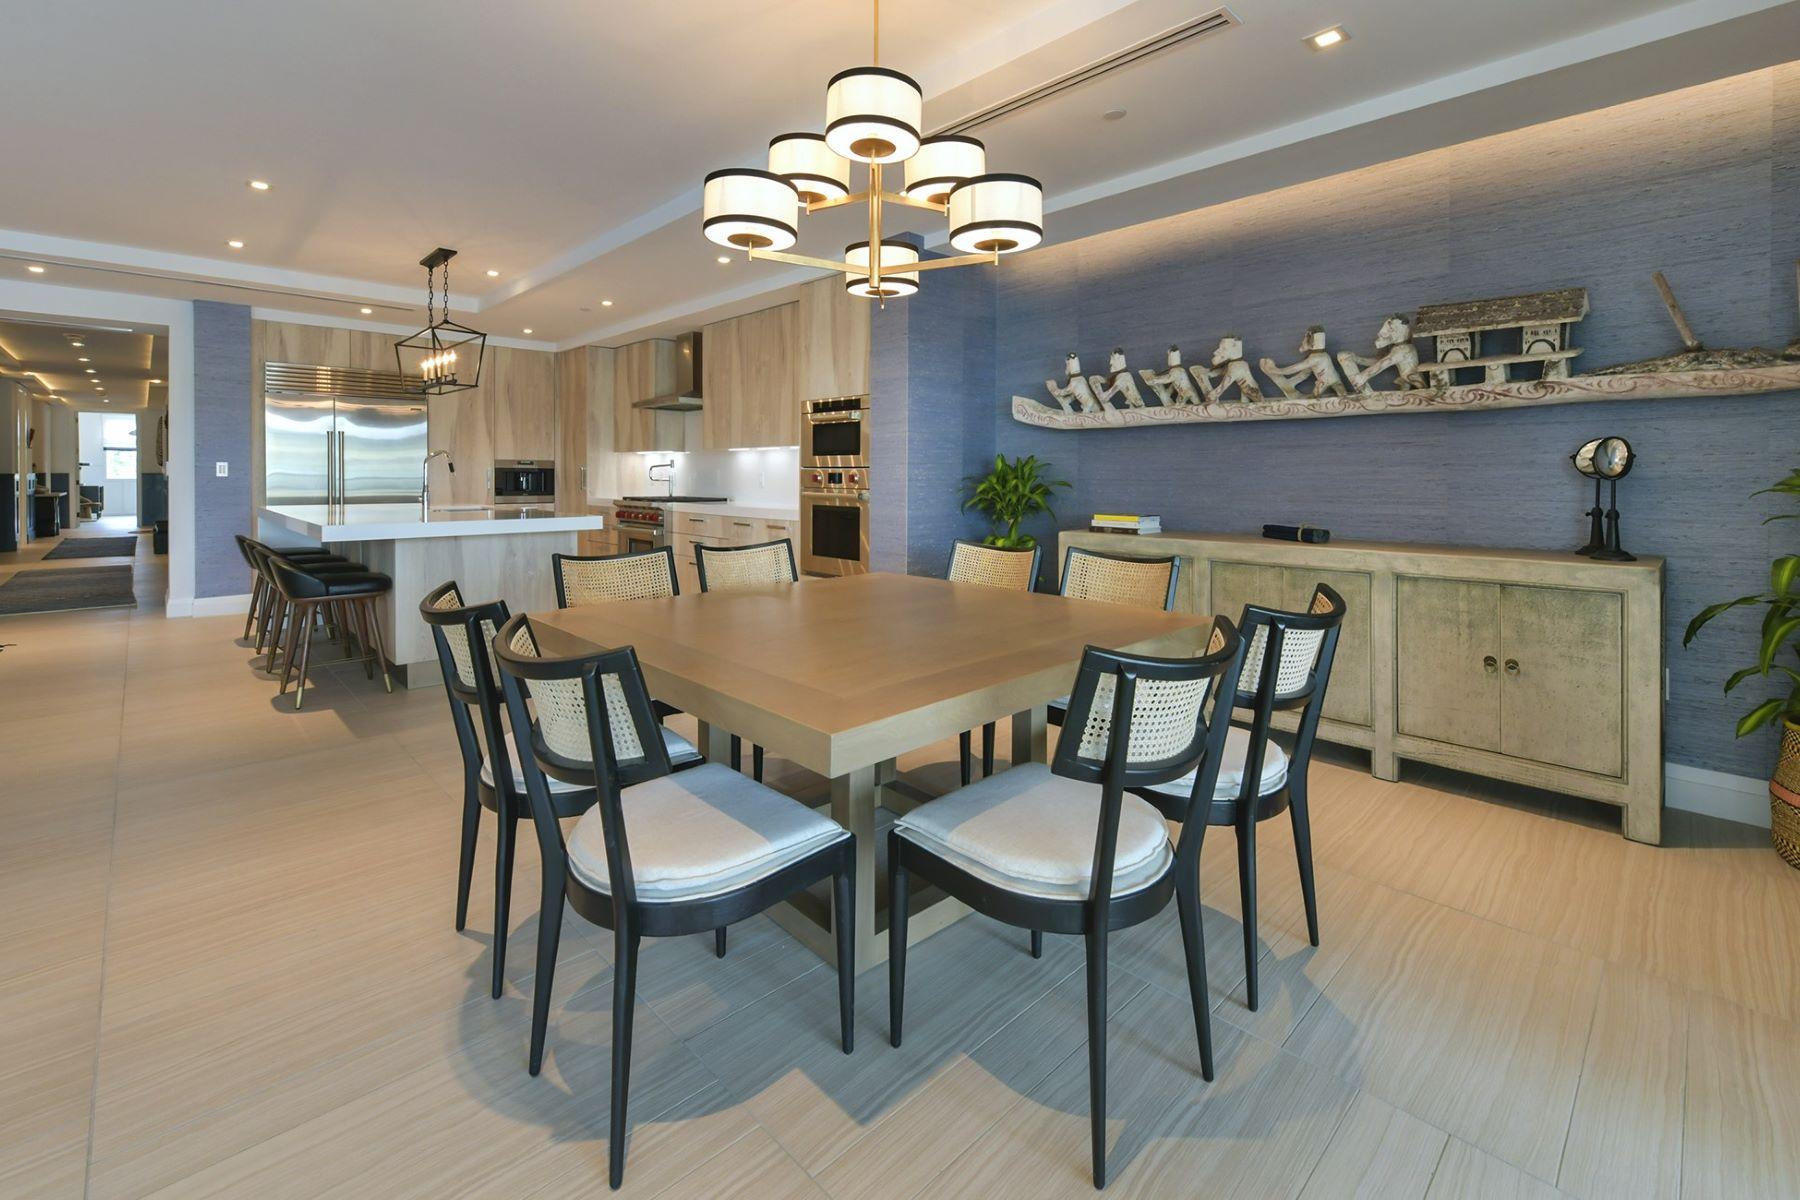 Condominiums for Sale at 111 Beach Road, #108, Key Largo, FL 111 Beach Road, 108, Key Largo, Florida 33037 United States